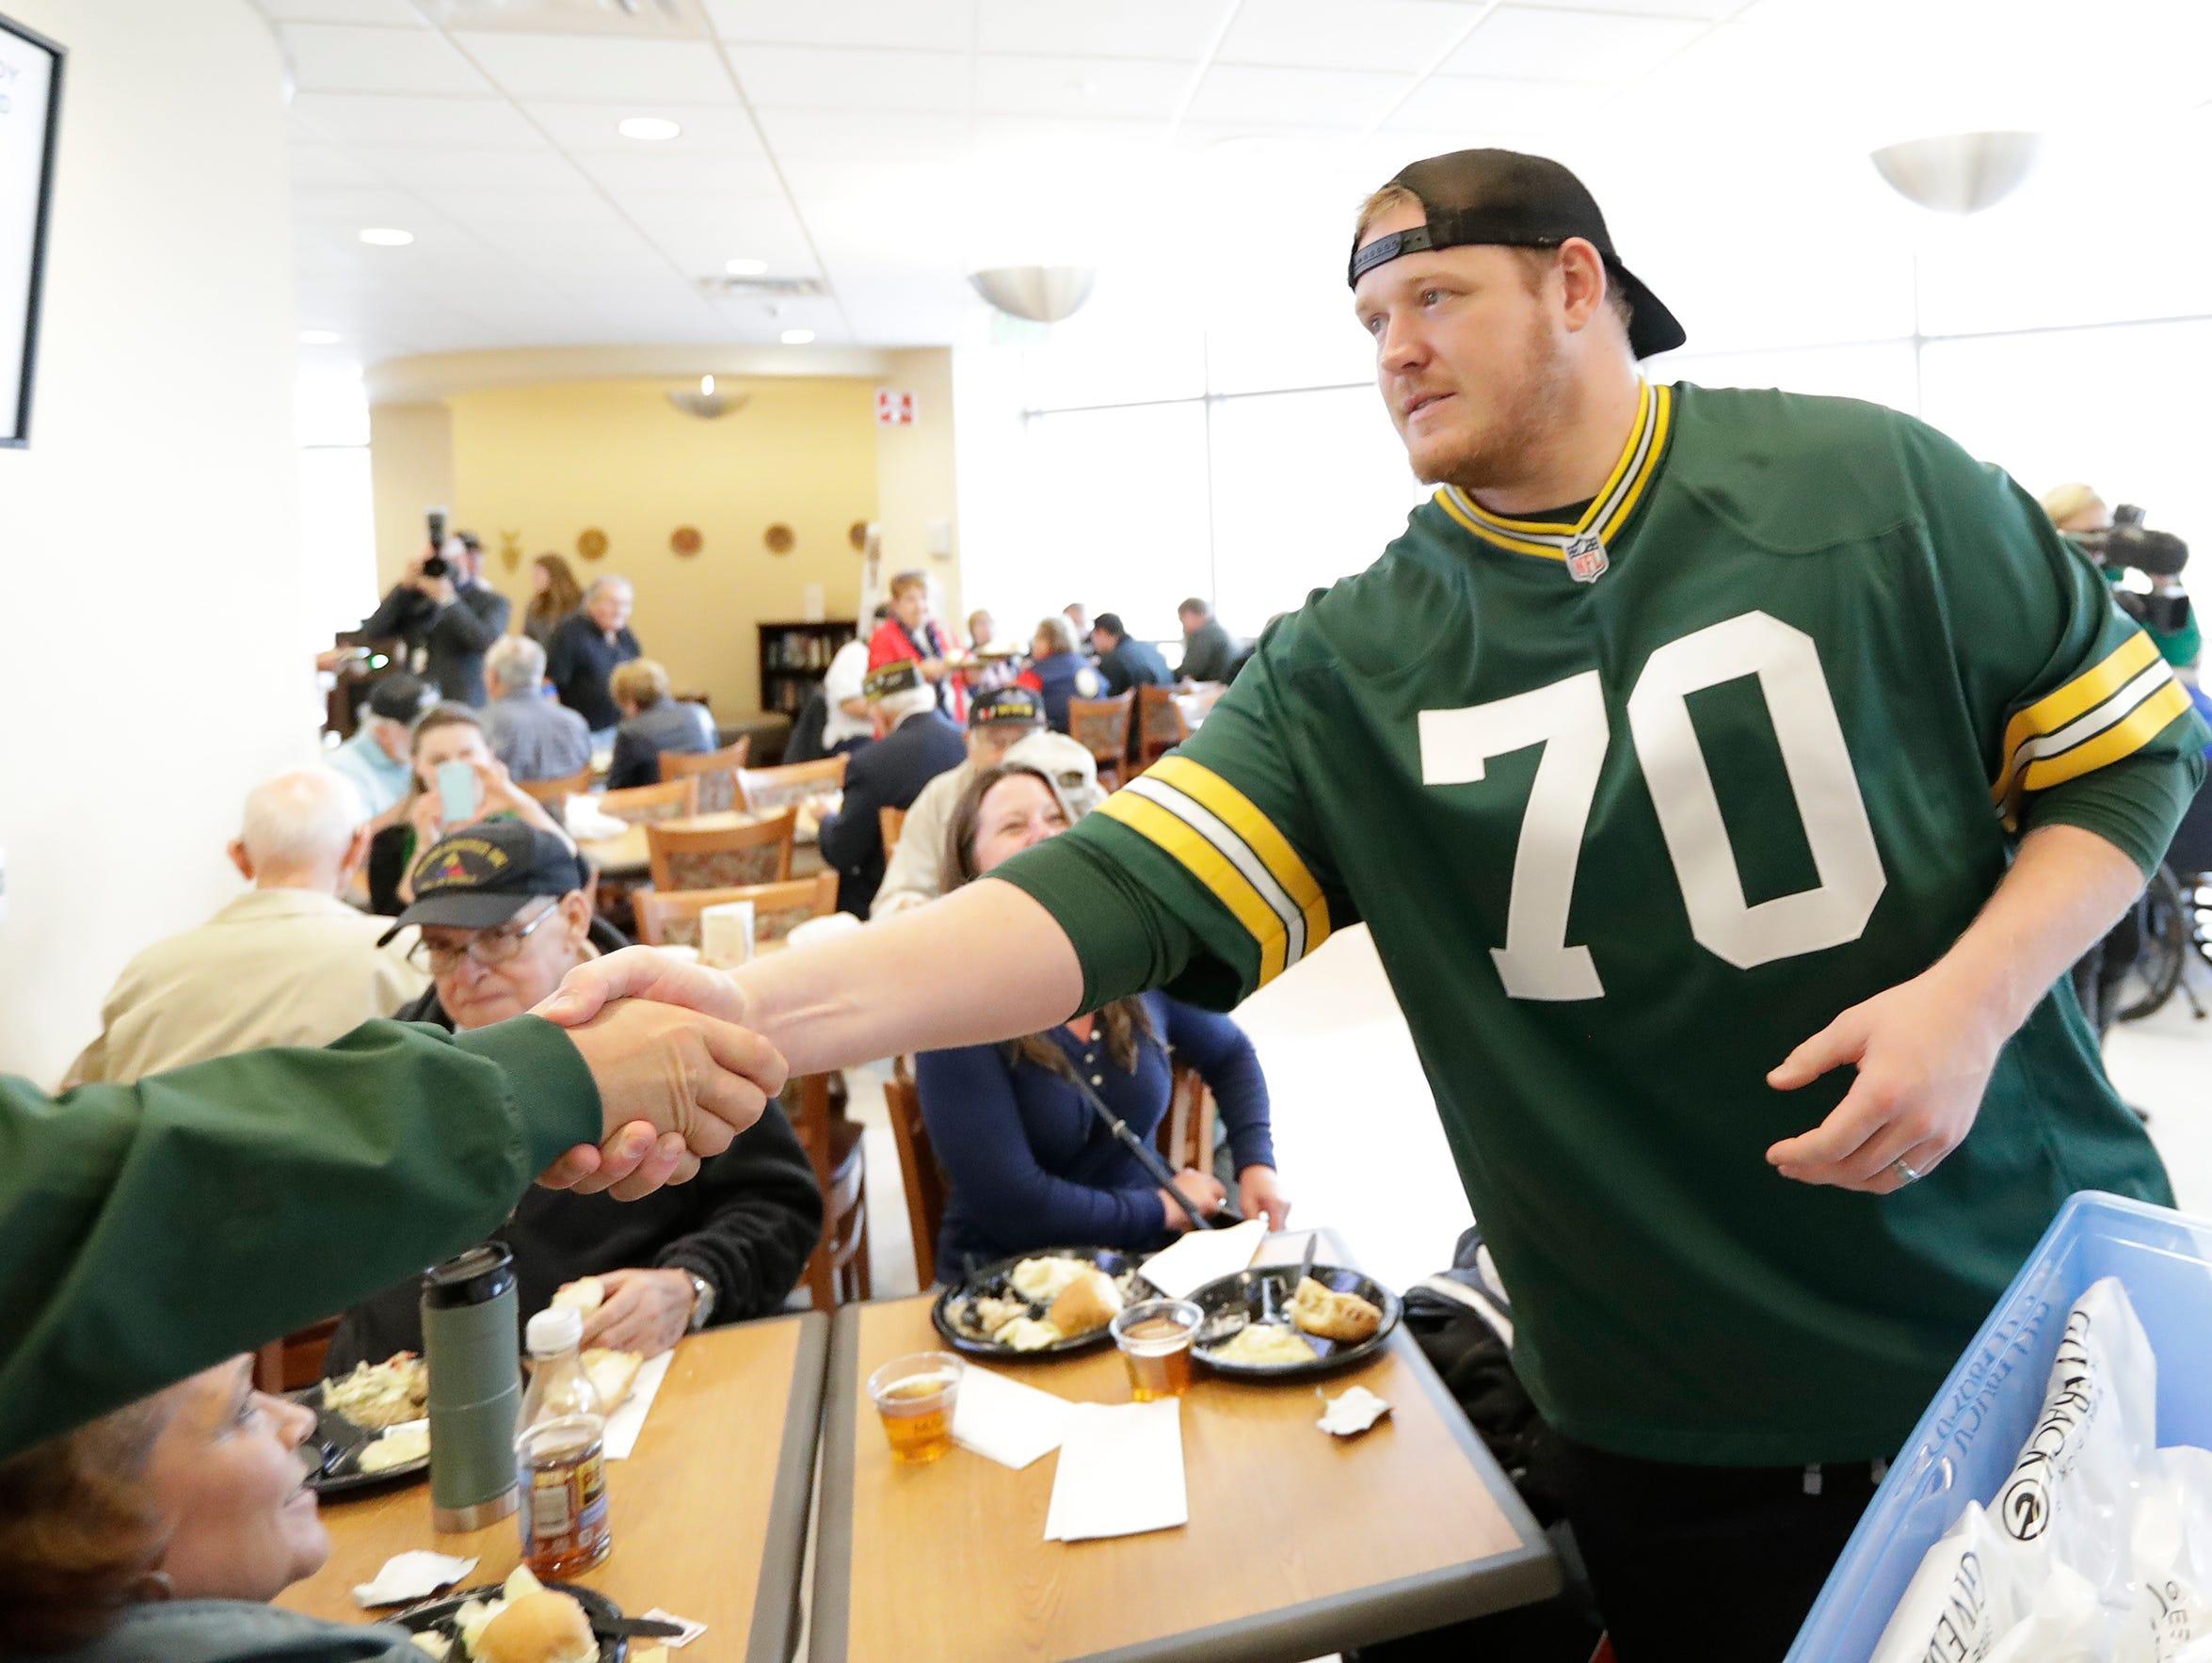 Green Bay Packers guard T.J. Lang (70) shakes the hand